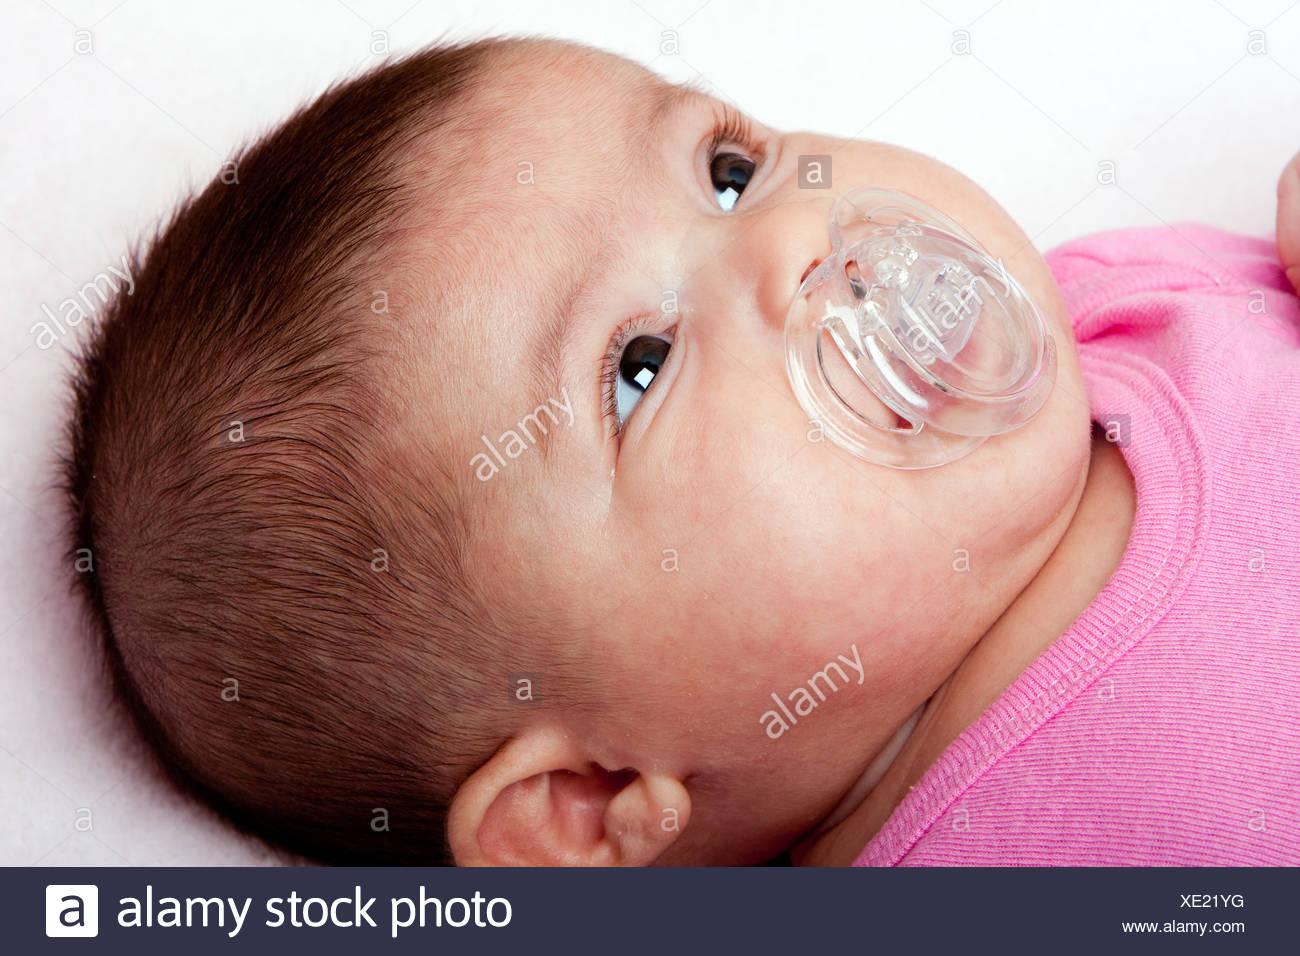 Beautiful caucasian hispanic latina baby infant girl with plastic pacifier cute face of a newborn